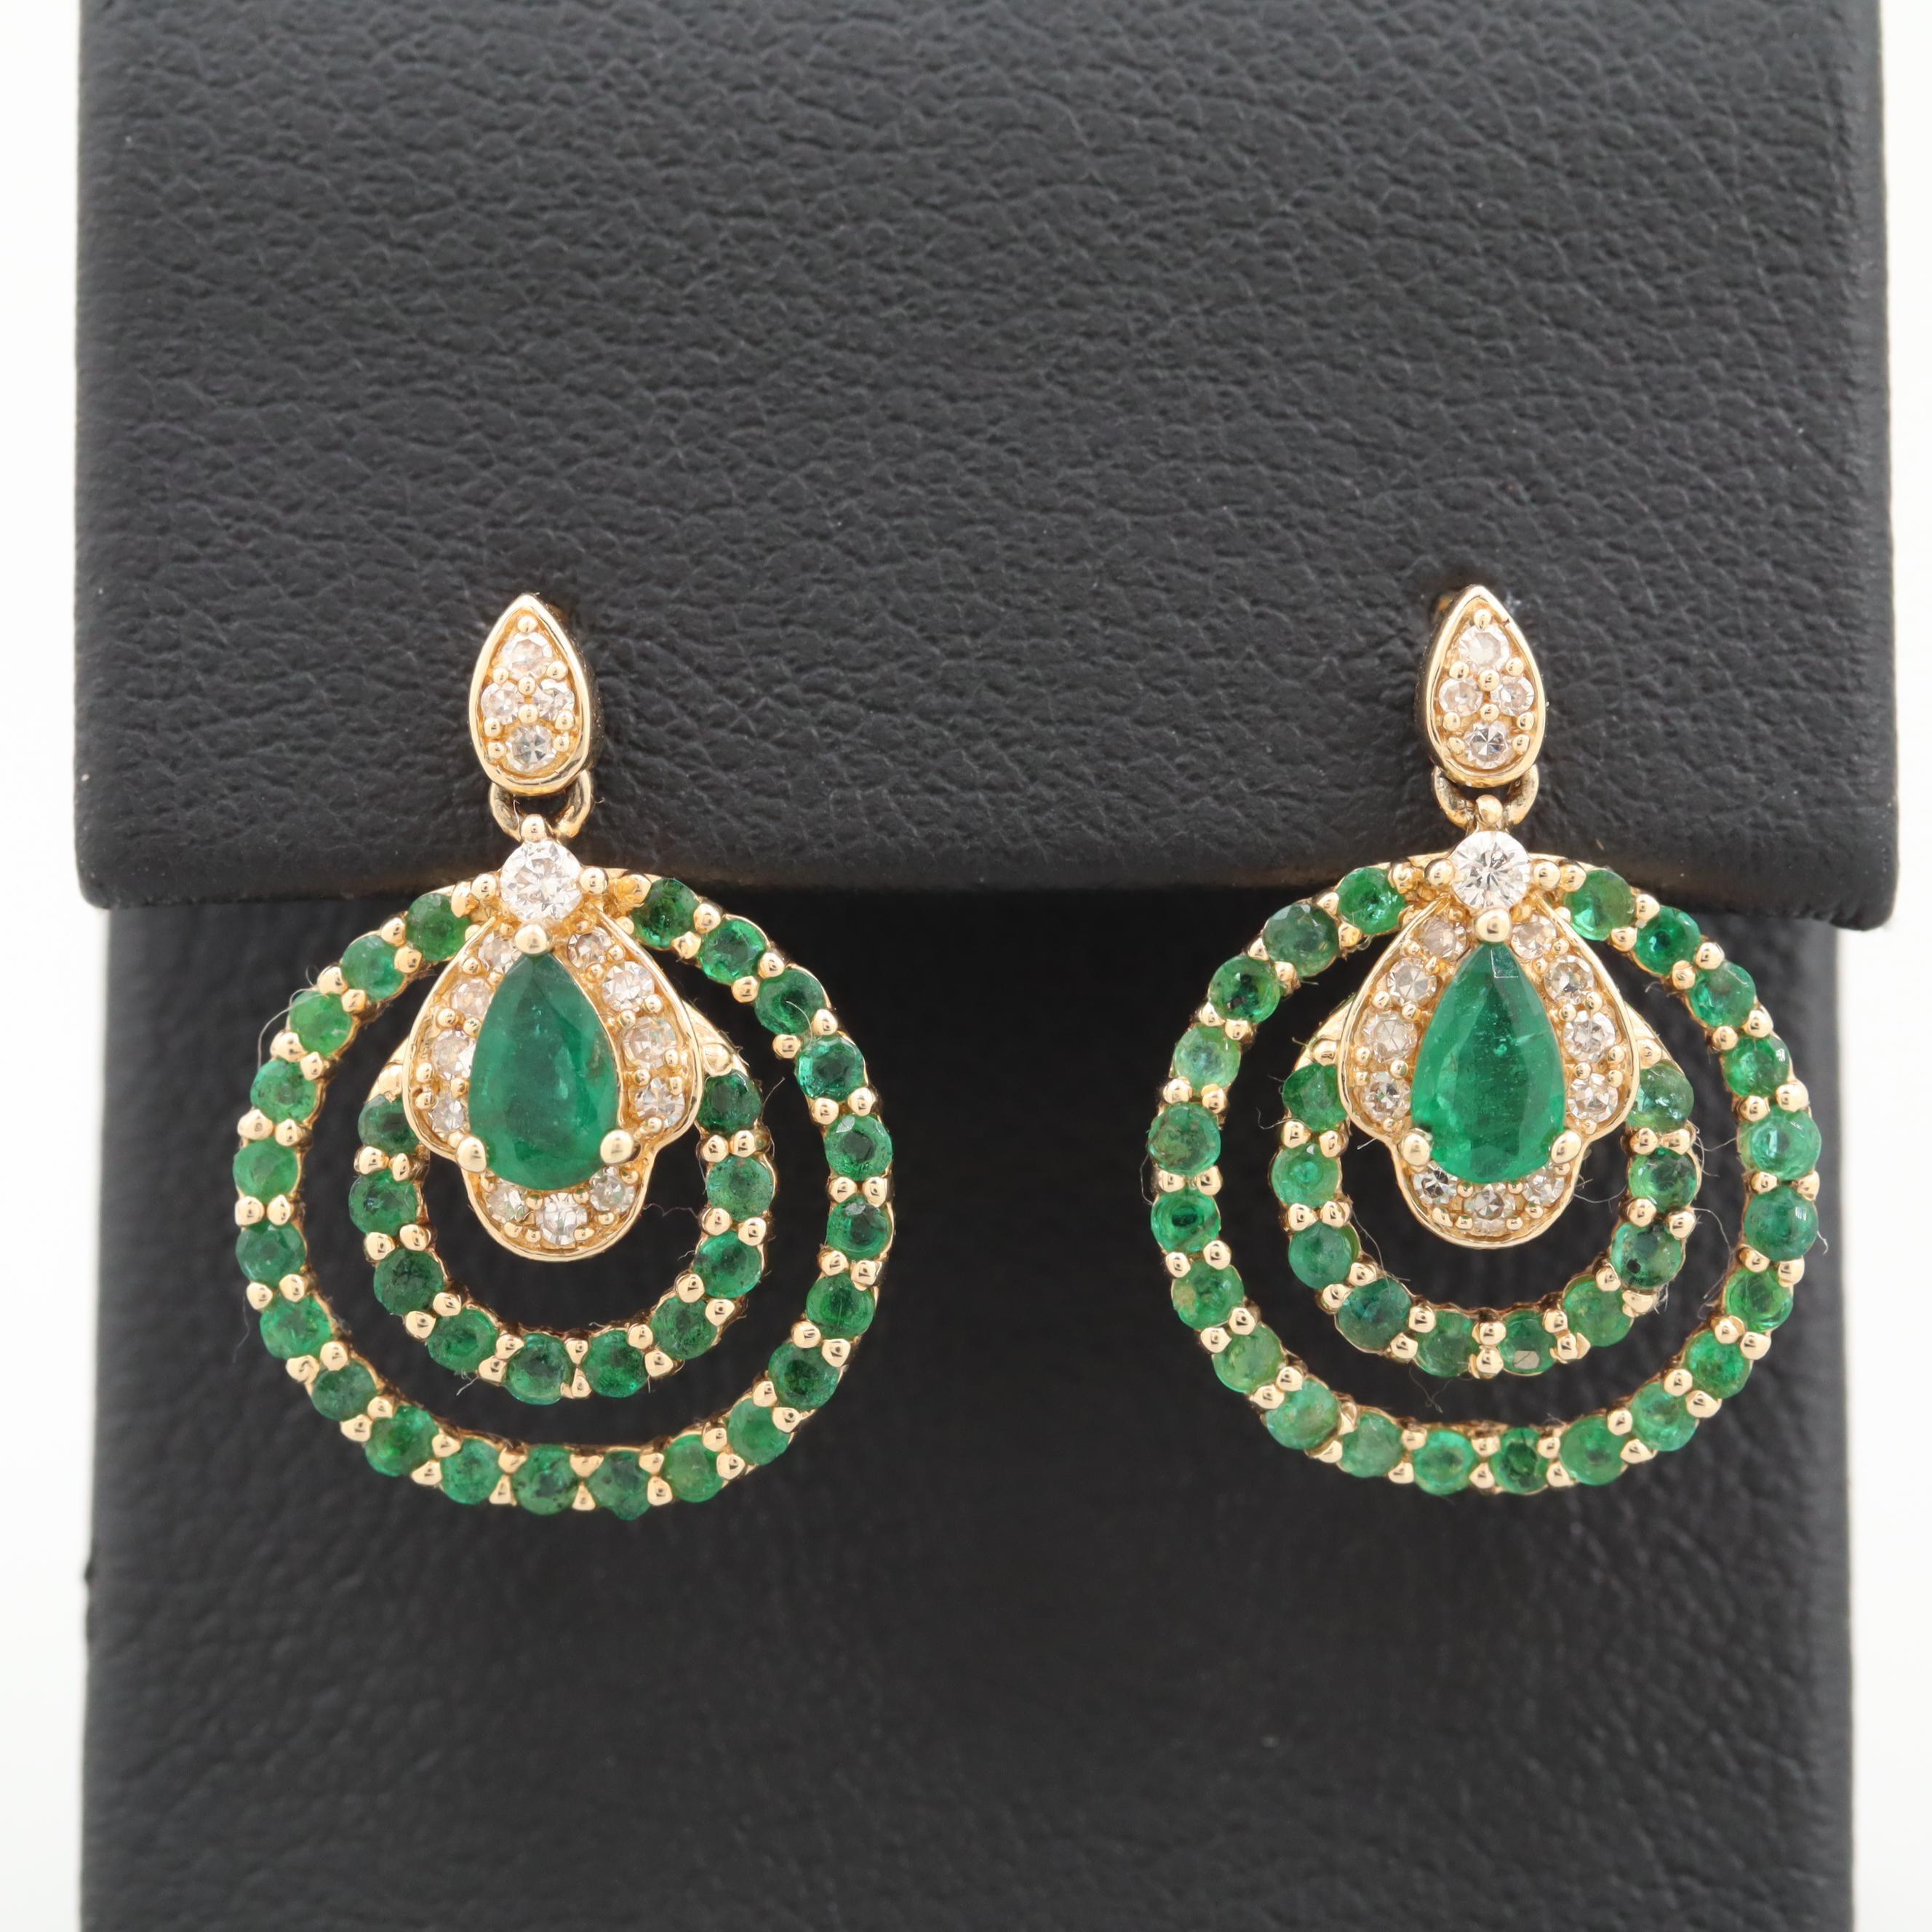 14K Yellow Gold Emerald and Diamond Dangle Earrings